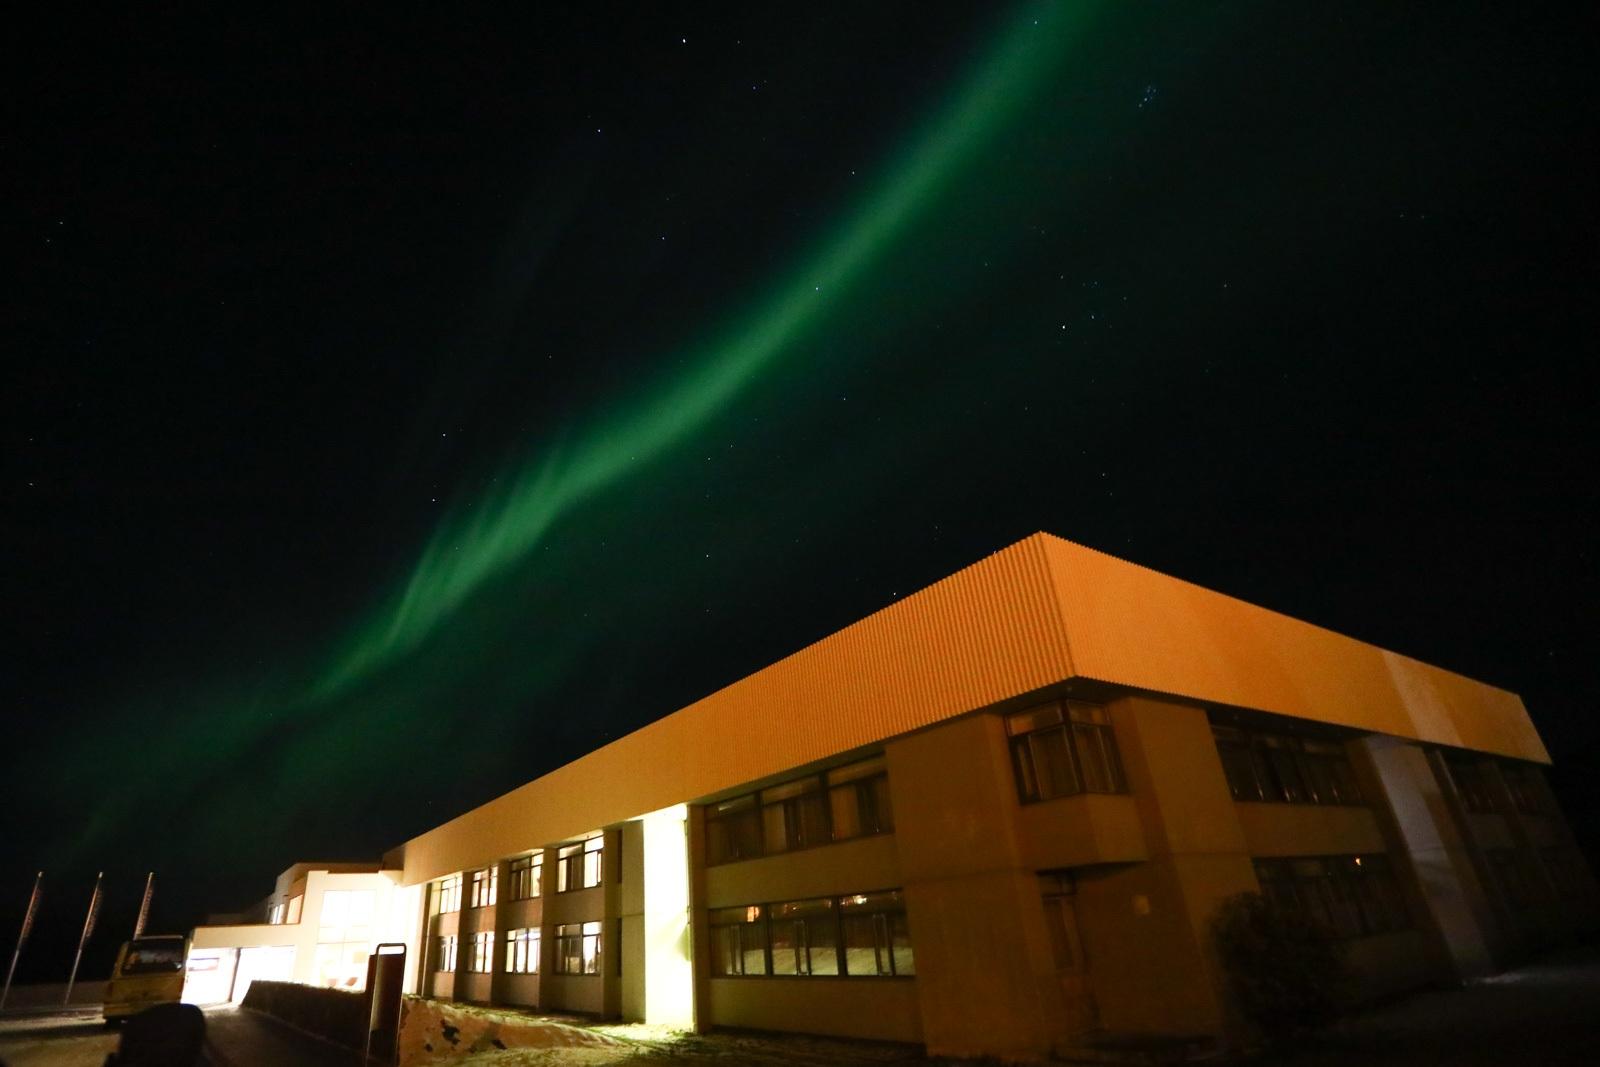 Aurora Boreal na Islândia - 24/10/2019